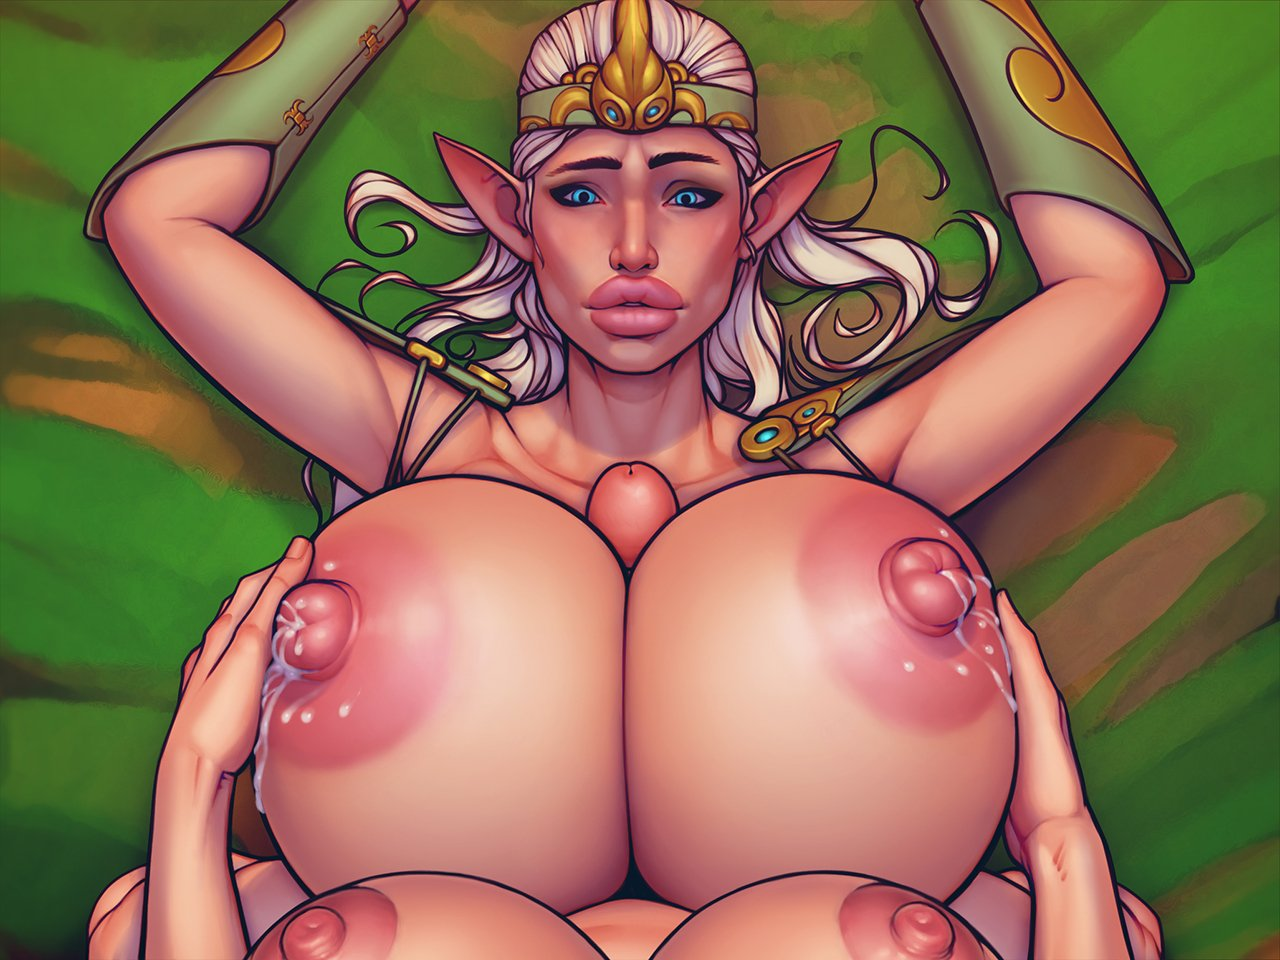 big big boobs boobs boobs big Fate go tamamo no mae